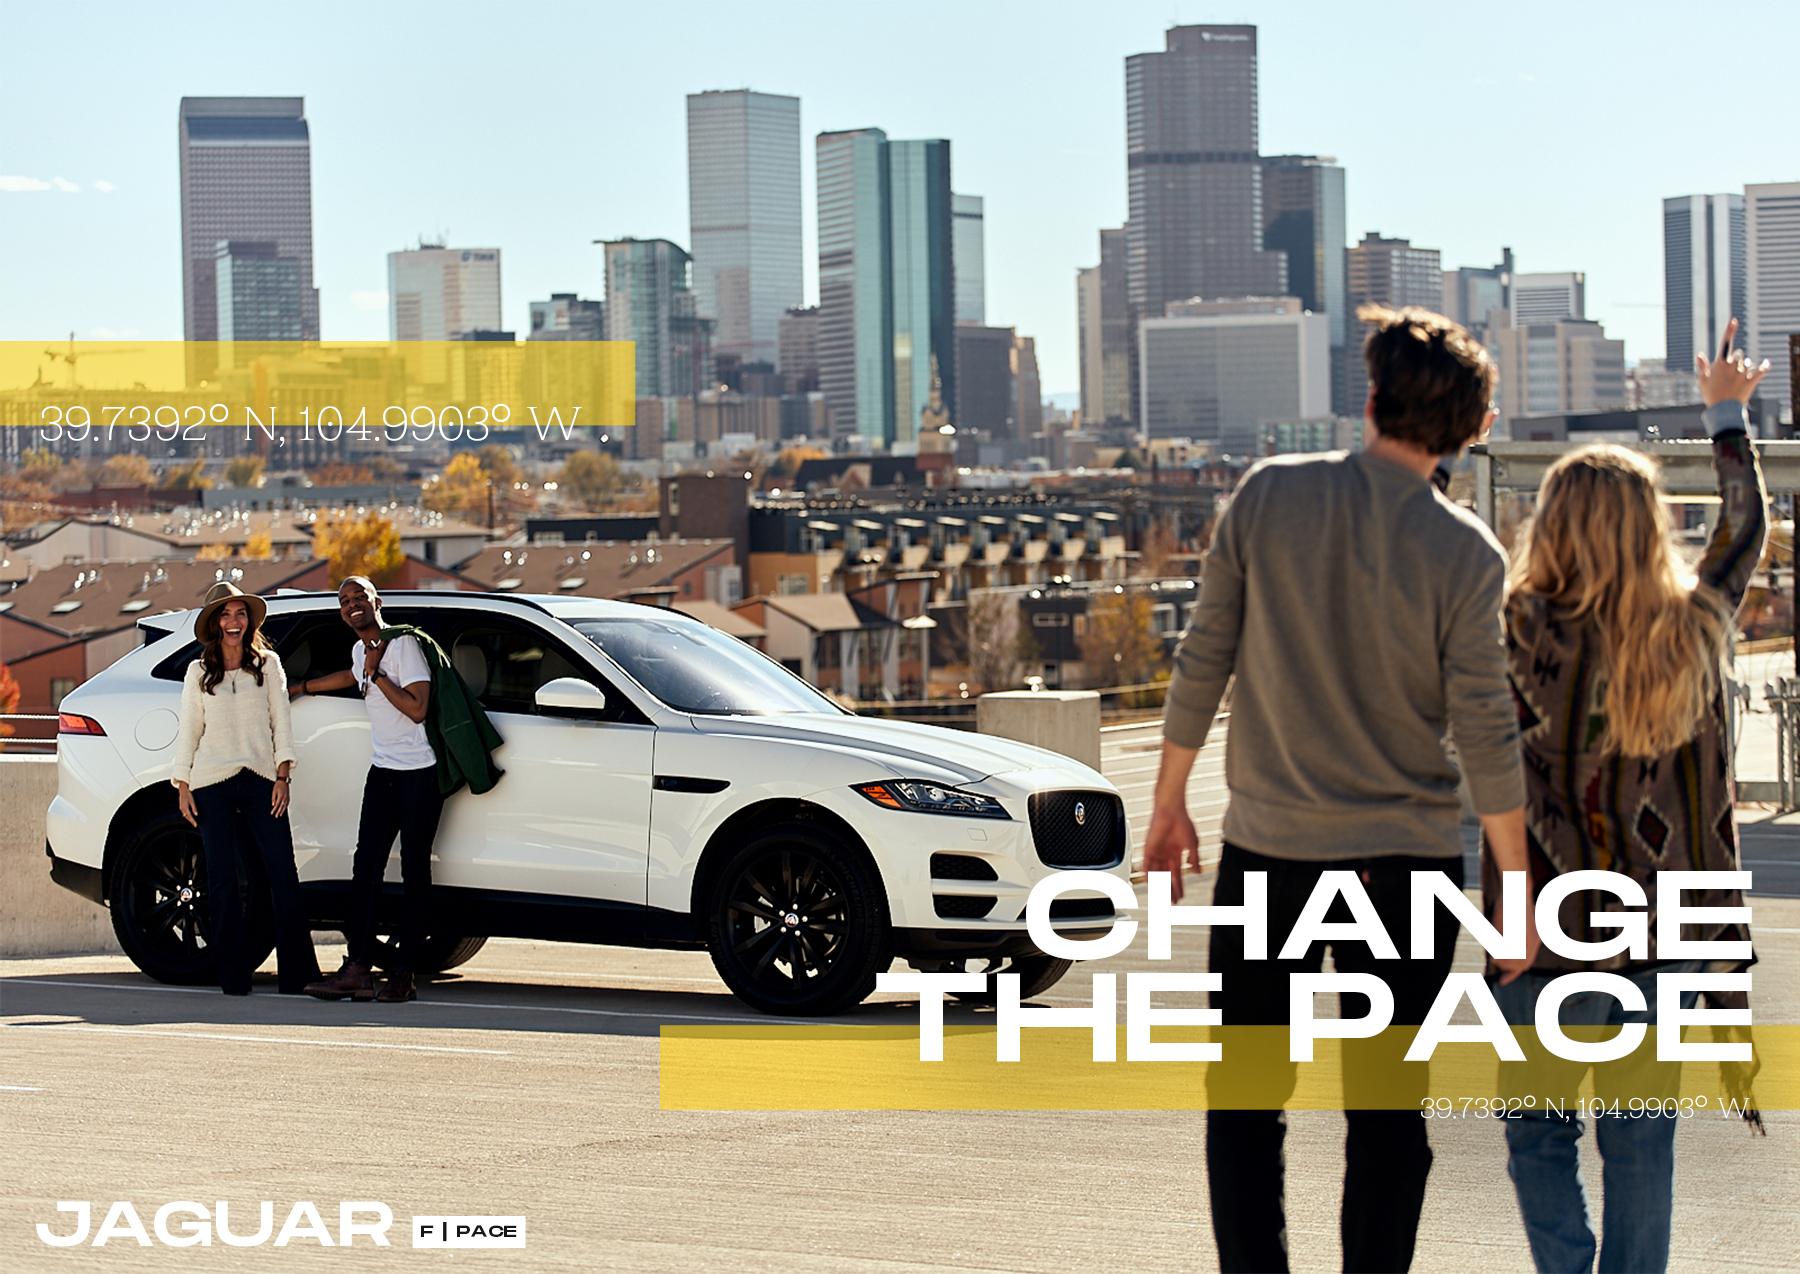 Jaguar_ConceptBoard2 (1).jpg